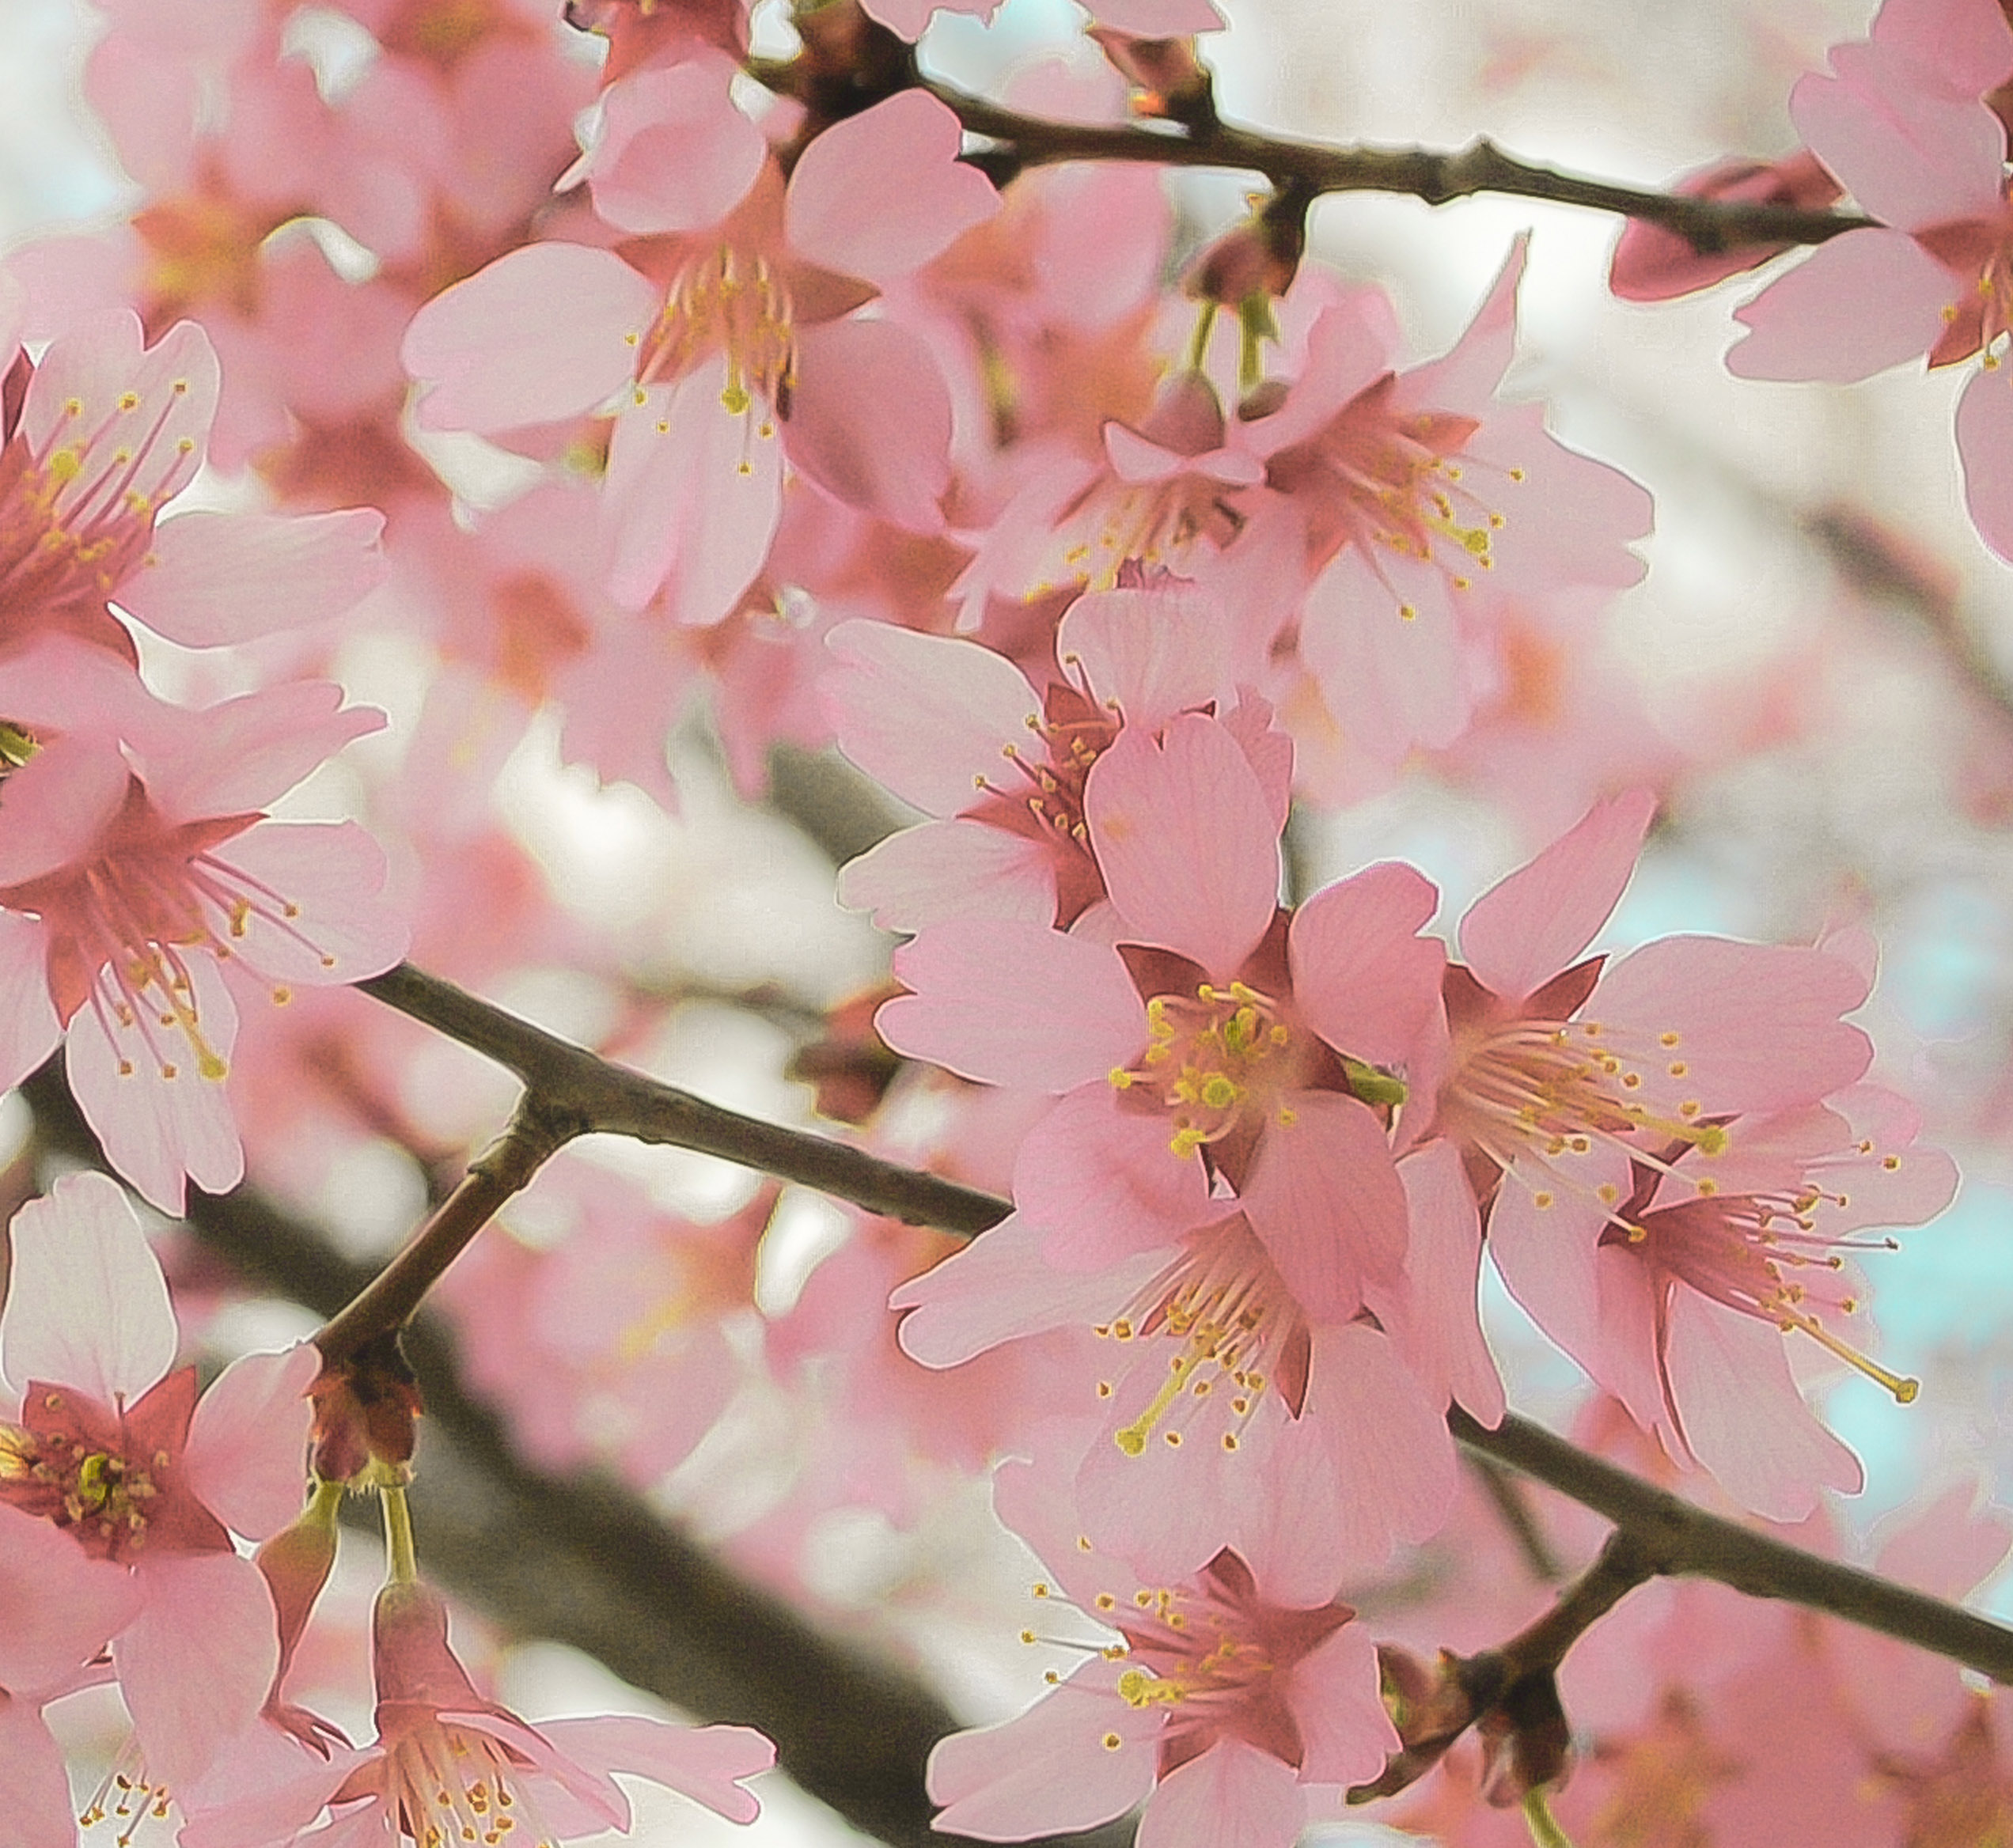 reverence 8 x 10 fine art photograph cherry blossom